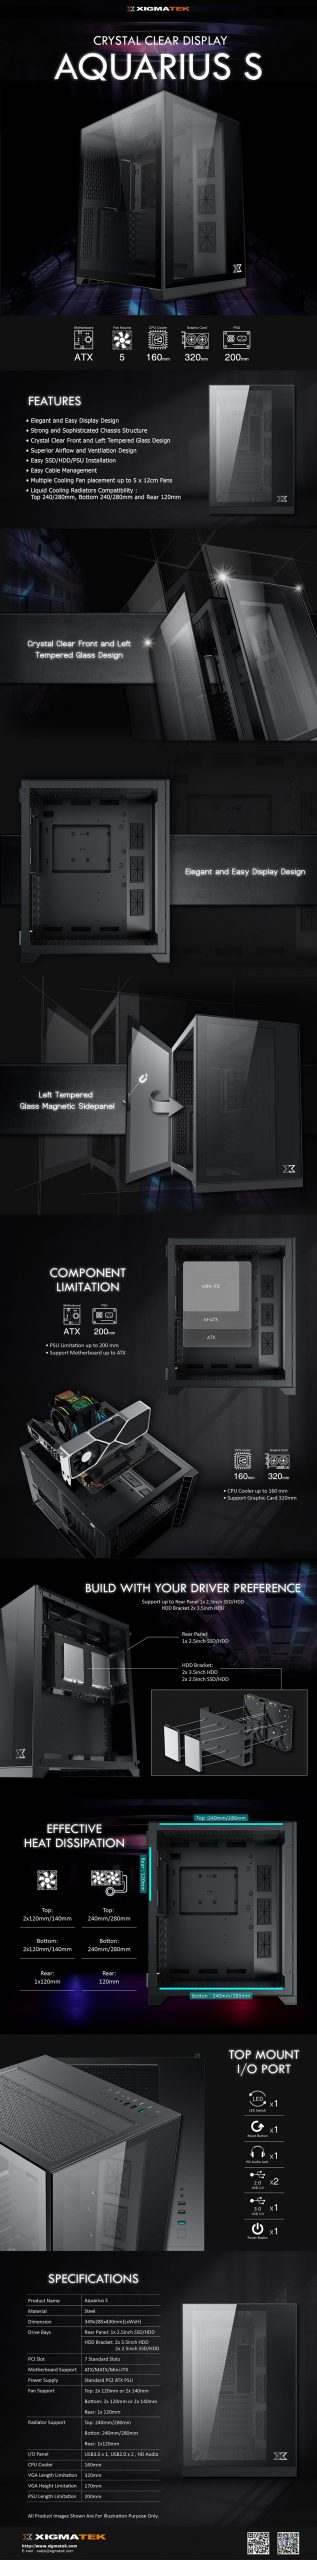 Vỏ Case Xigmatek AQUARIUS S BLACK - EN46508